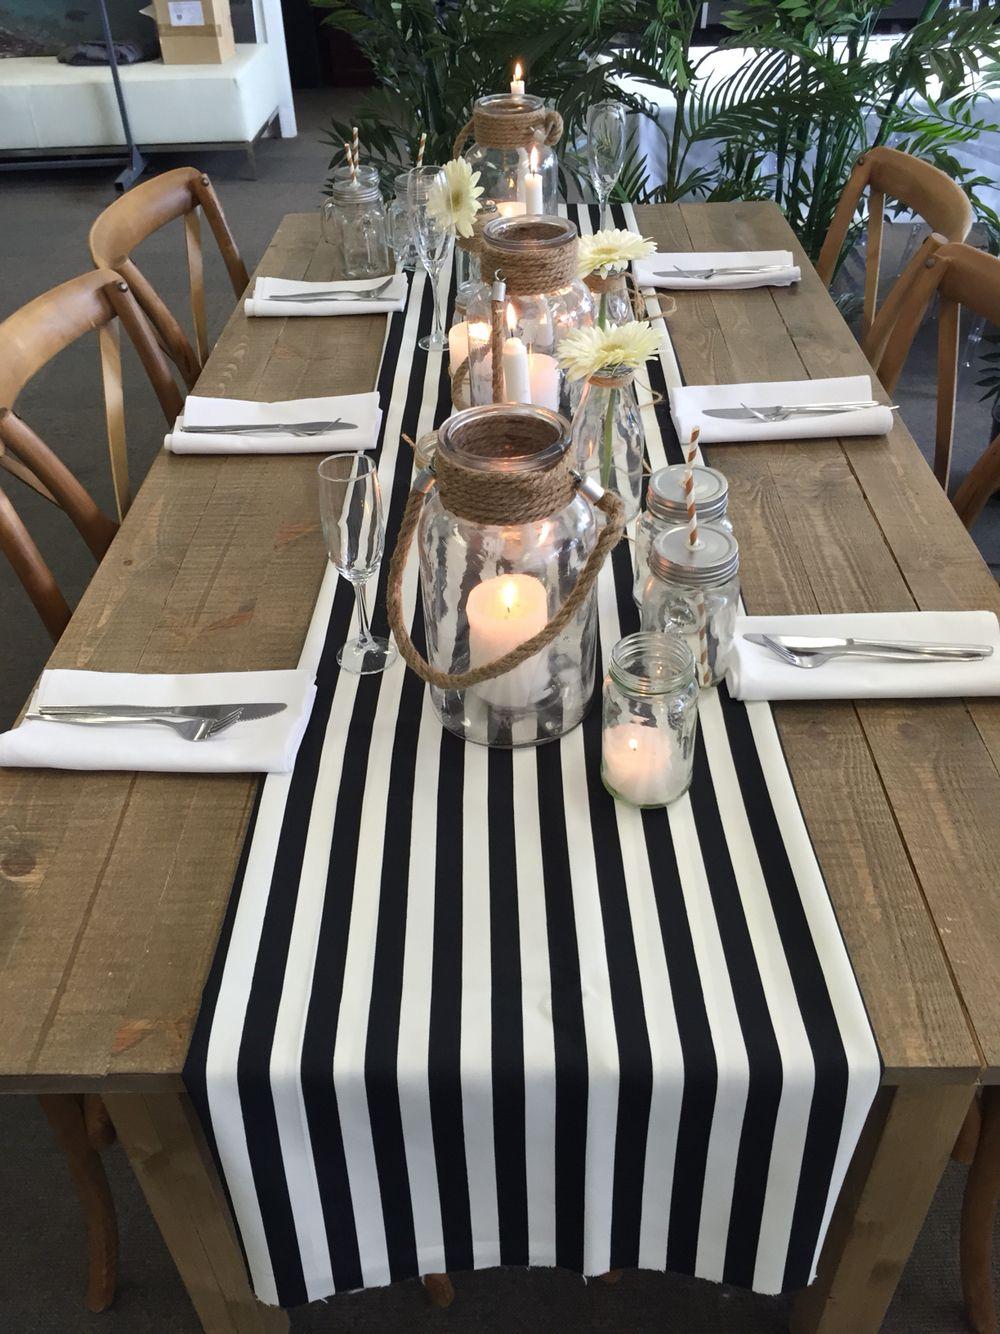 Rustic Table With Black And White Stripe Table Runner Black Decor Desk Decor White Decor